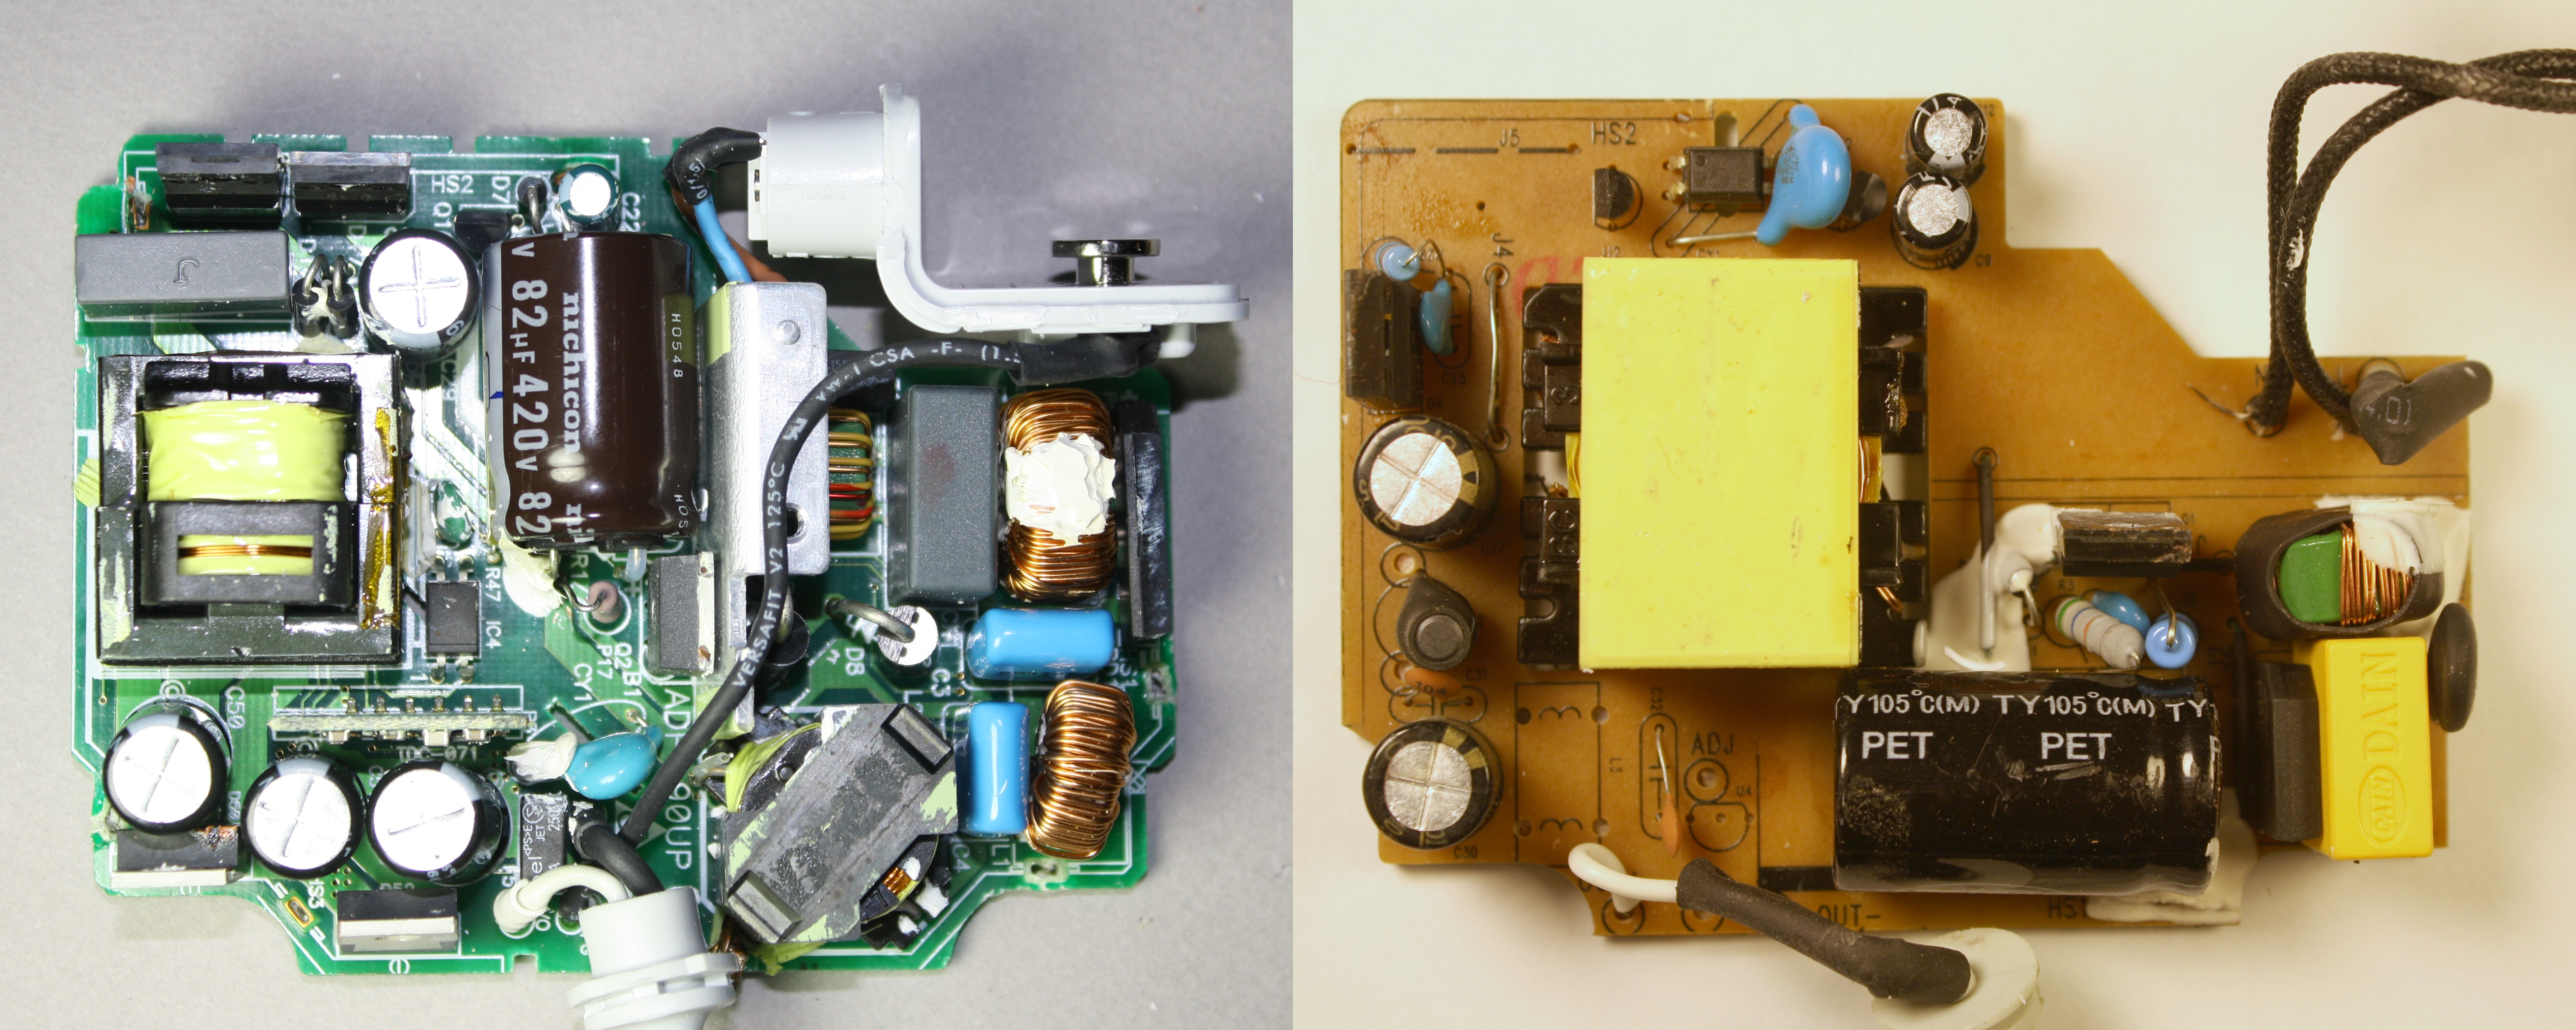 Carregador de MacBook original vs. falsificado